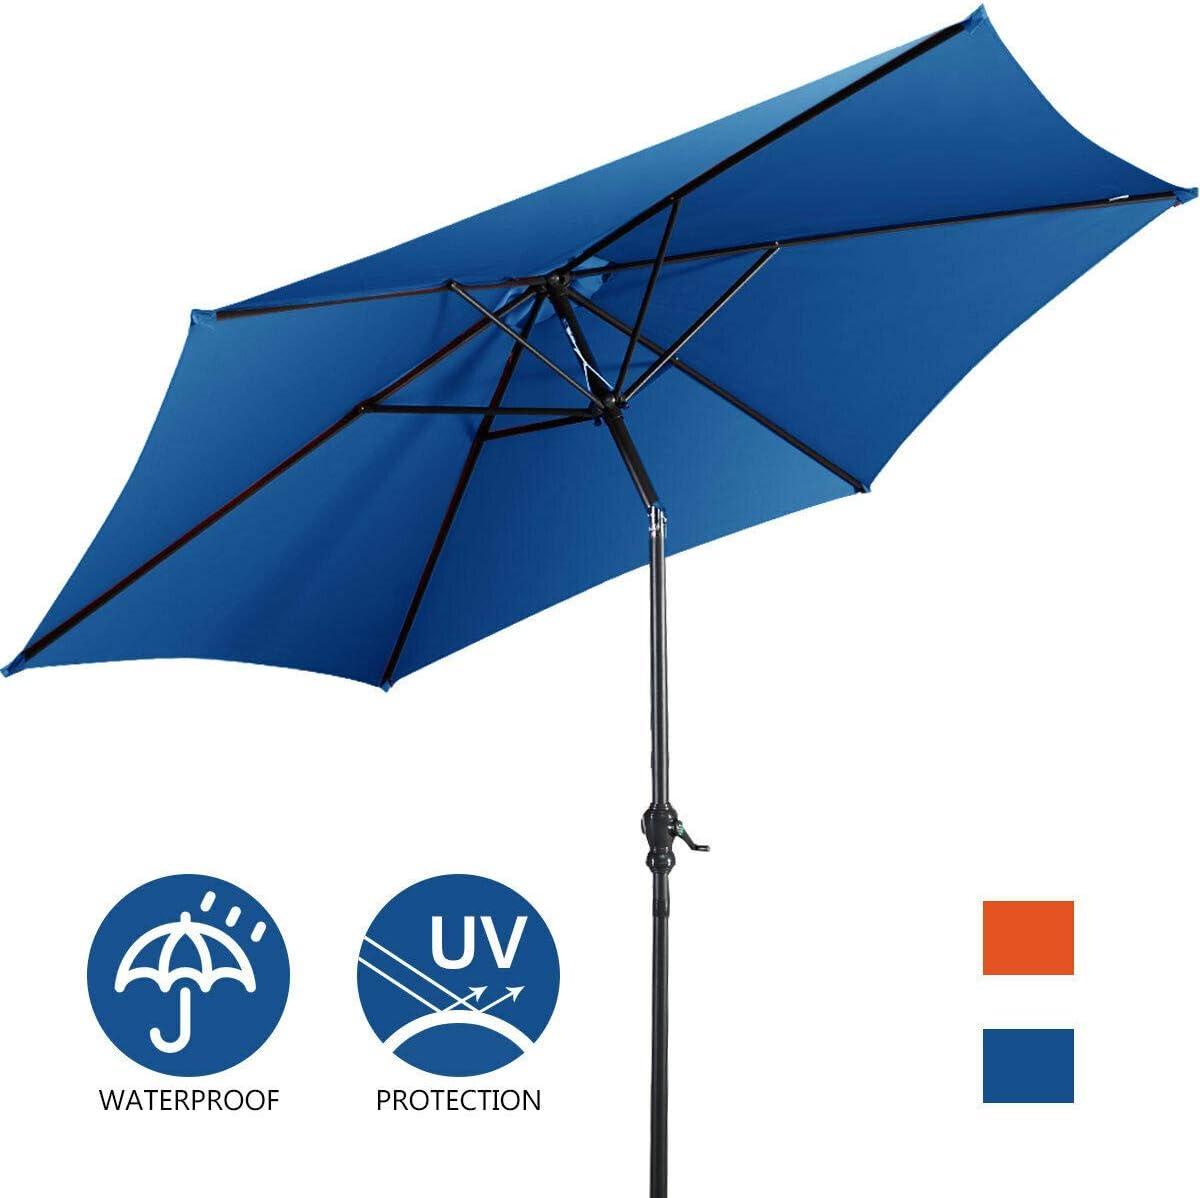 Giantex 9ft Solar Patio Umbrella Sunbrella Without LED Lighted, 6 Ribs Market Steel Tilt w Crank for Garden, Deck, Backyard, Pool Indoor Outdoor Use Blue